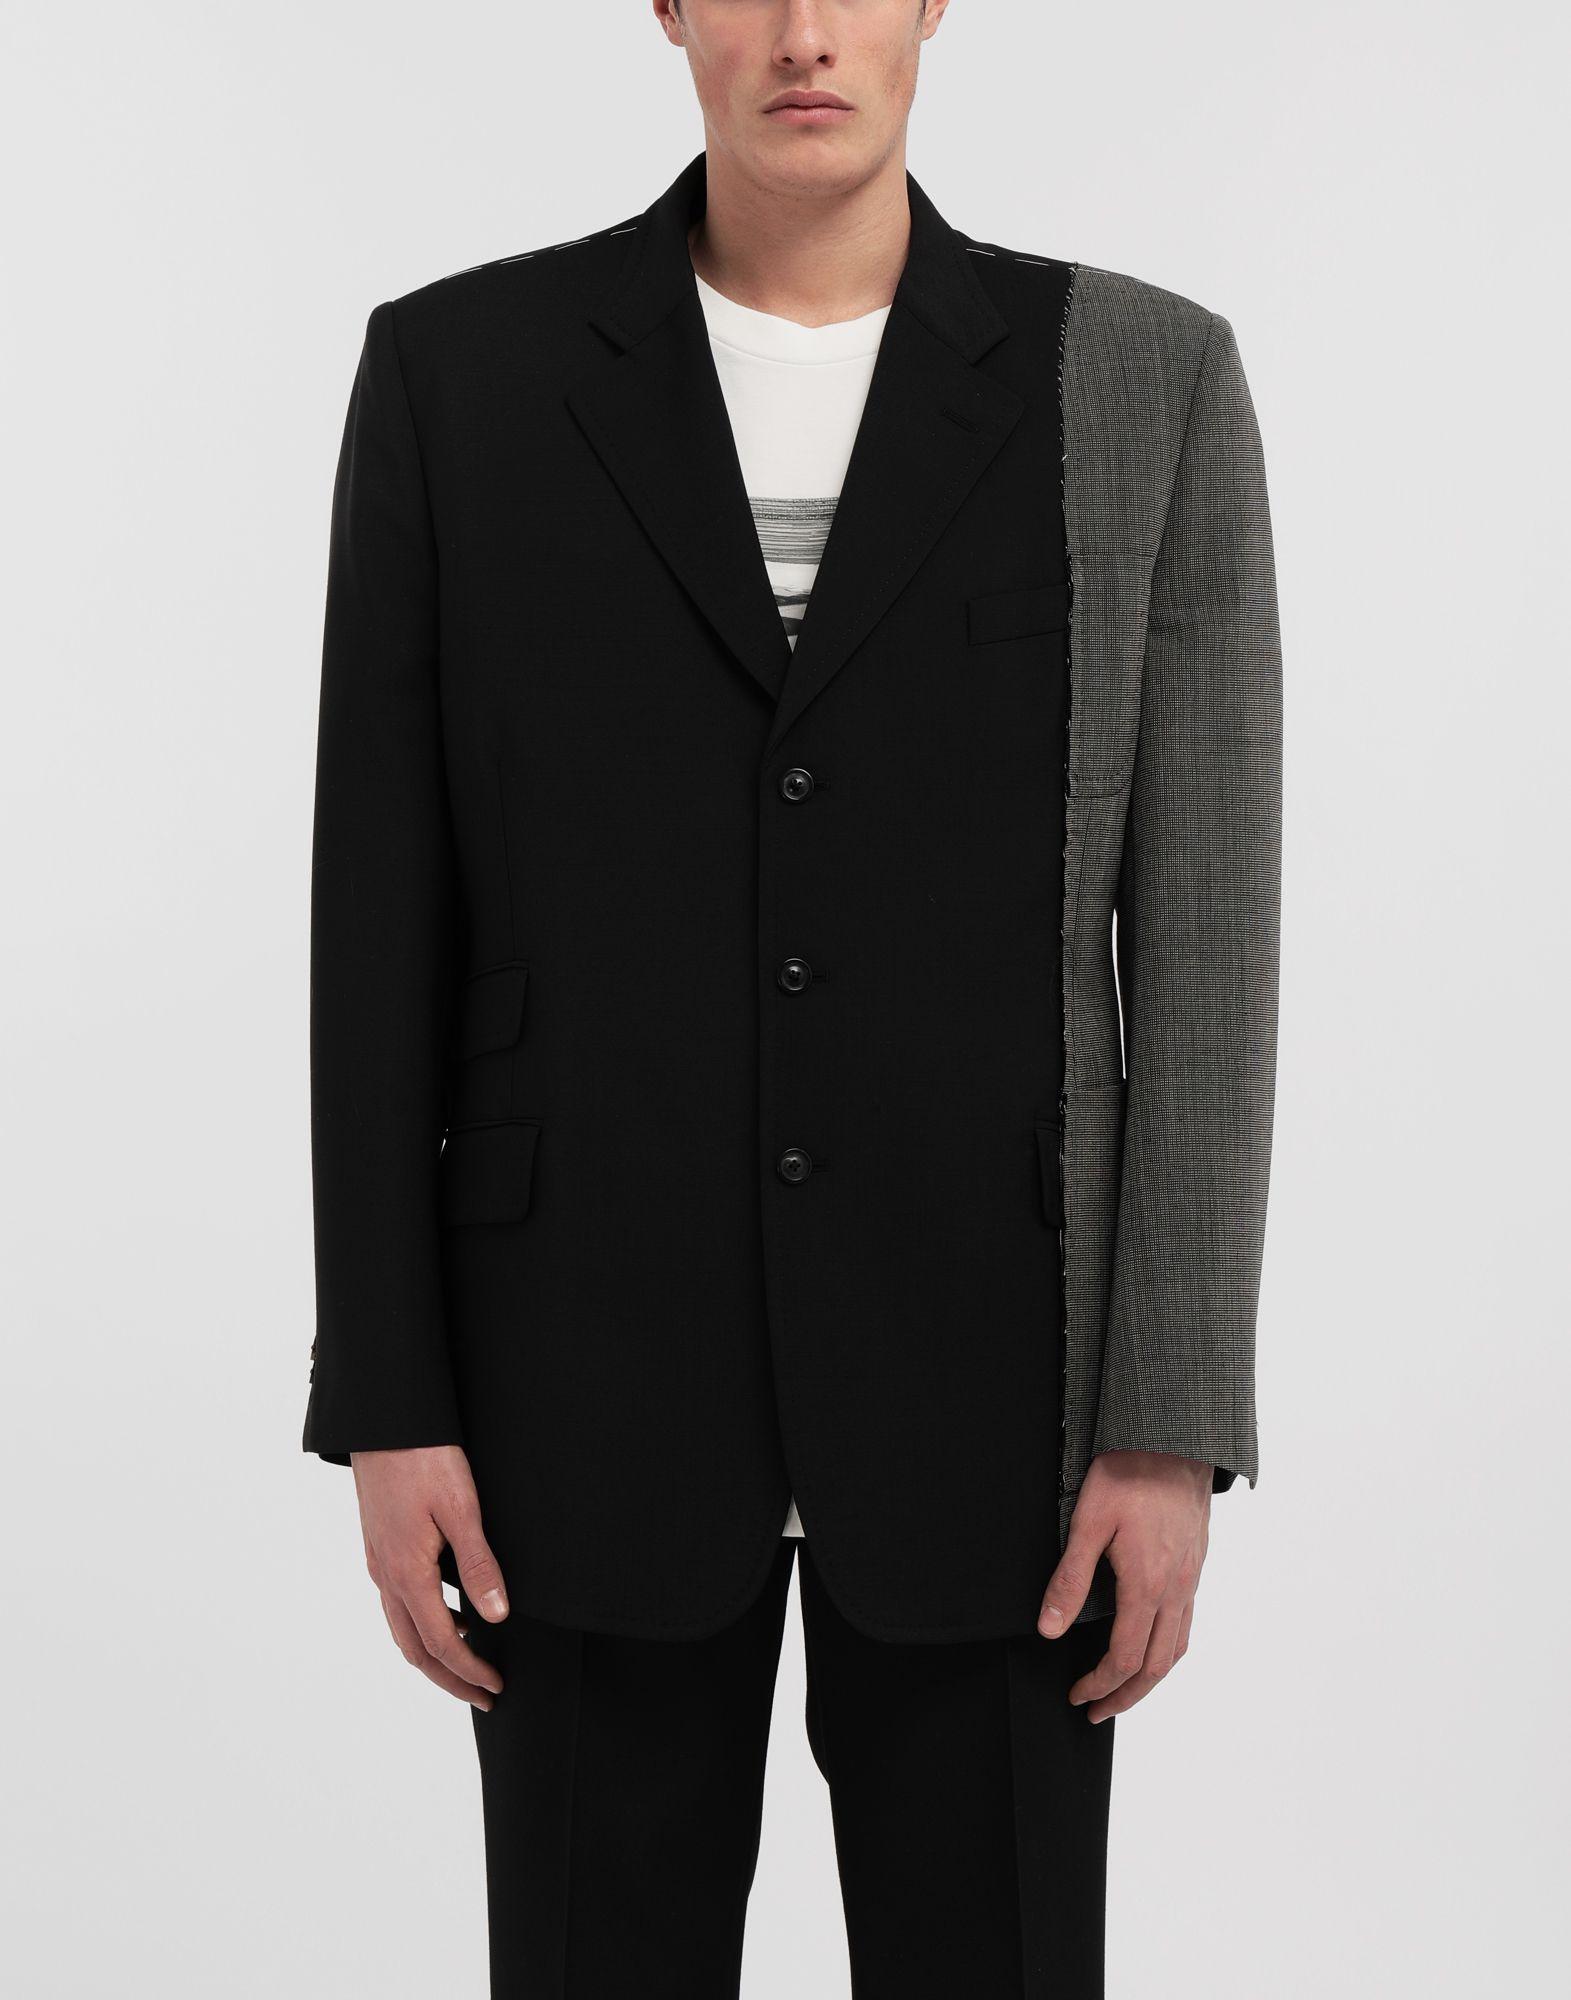 MAISON MARGIELA Spliced wool jacket Blazer Man r